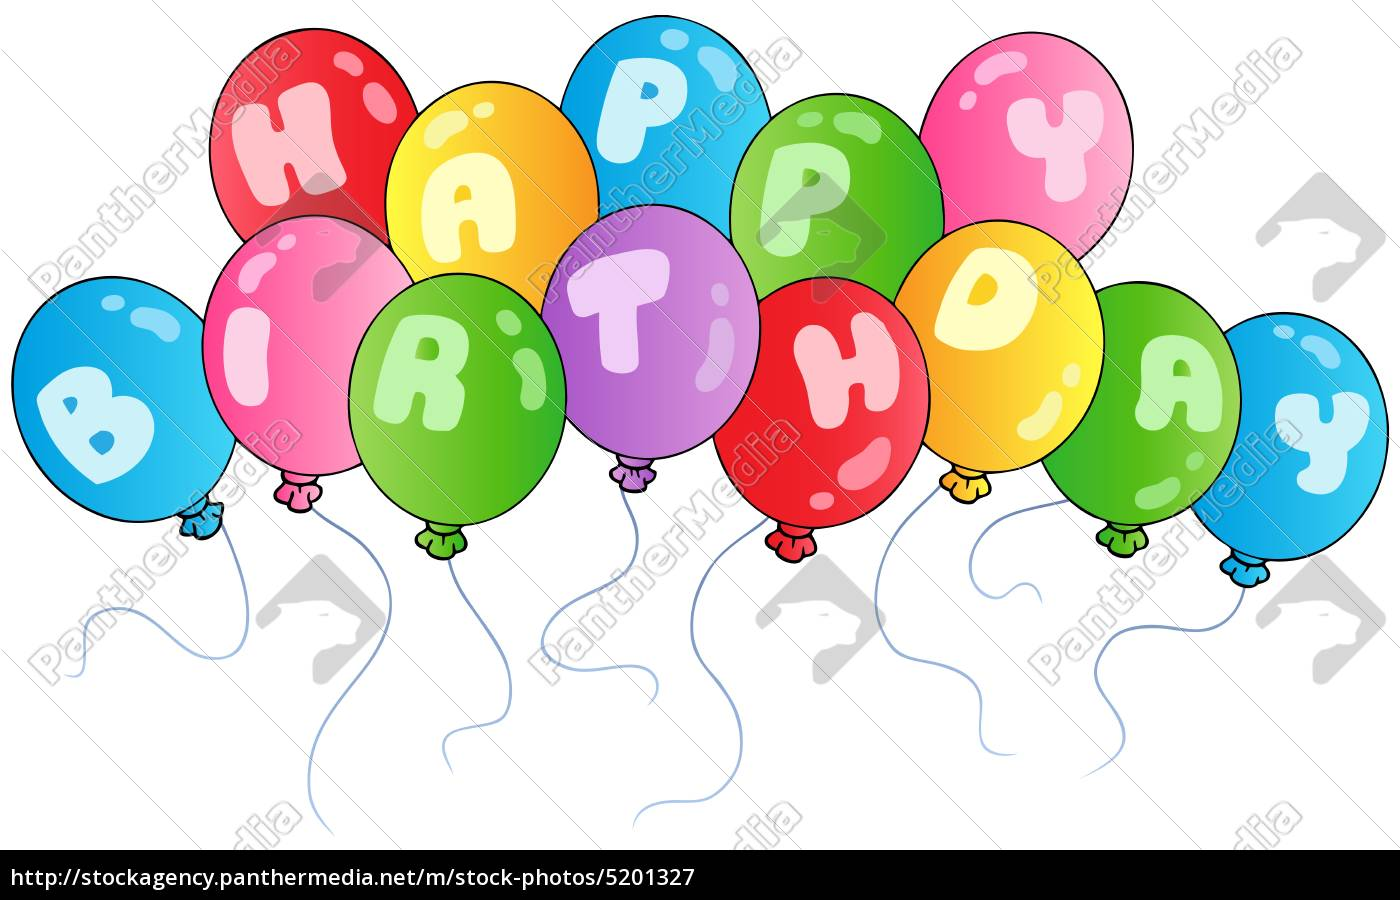 Alles Gute Zum Geburtstag Ballons Lizenzfreies Bild 5201327